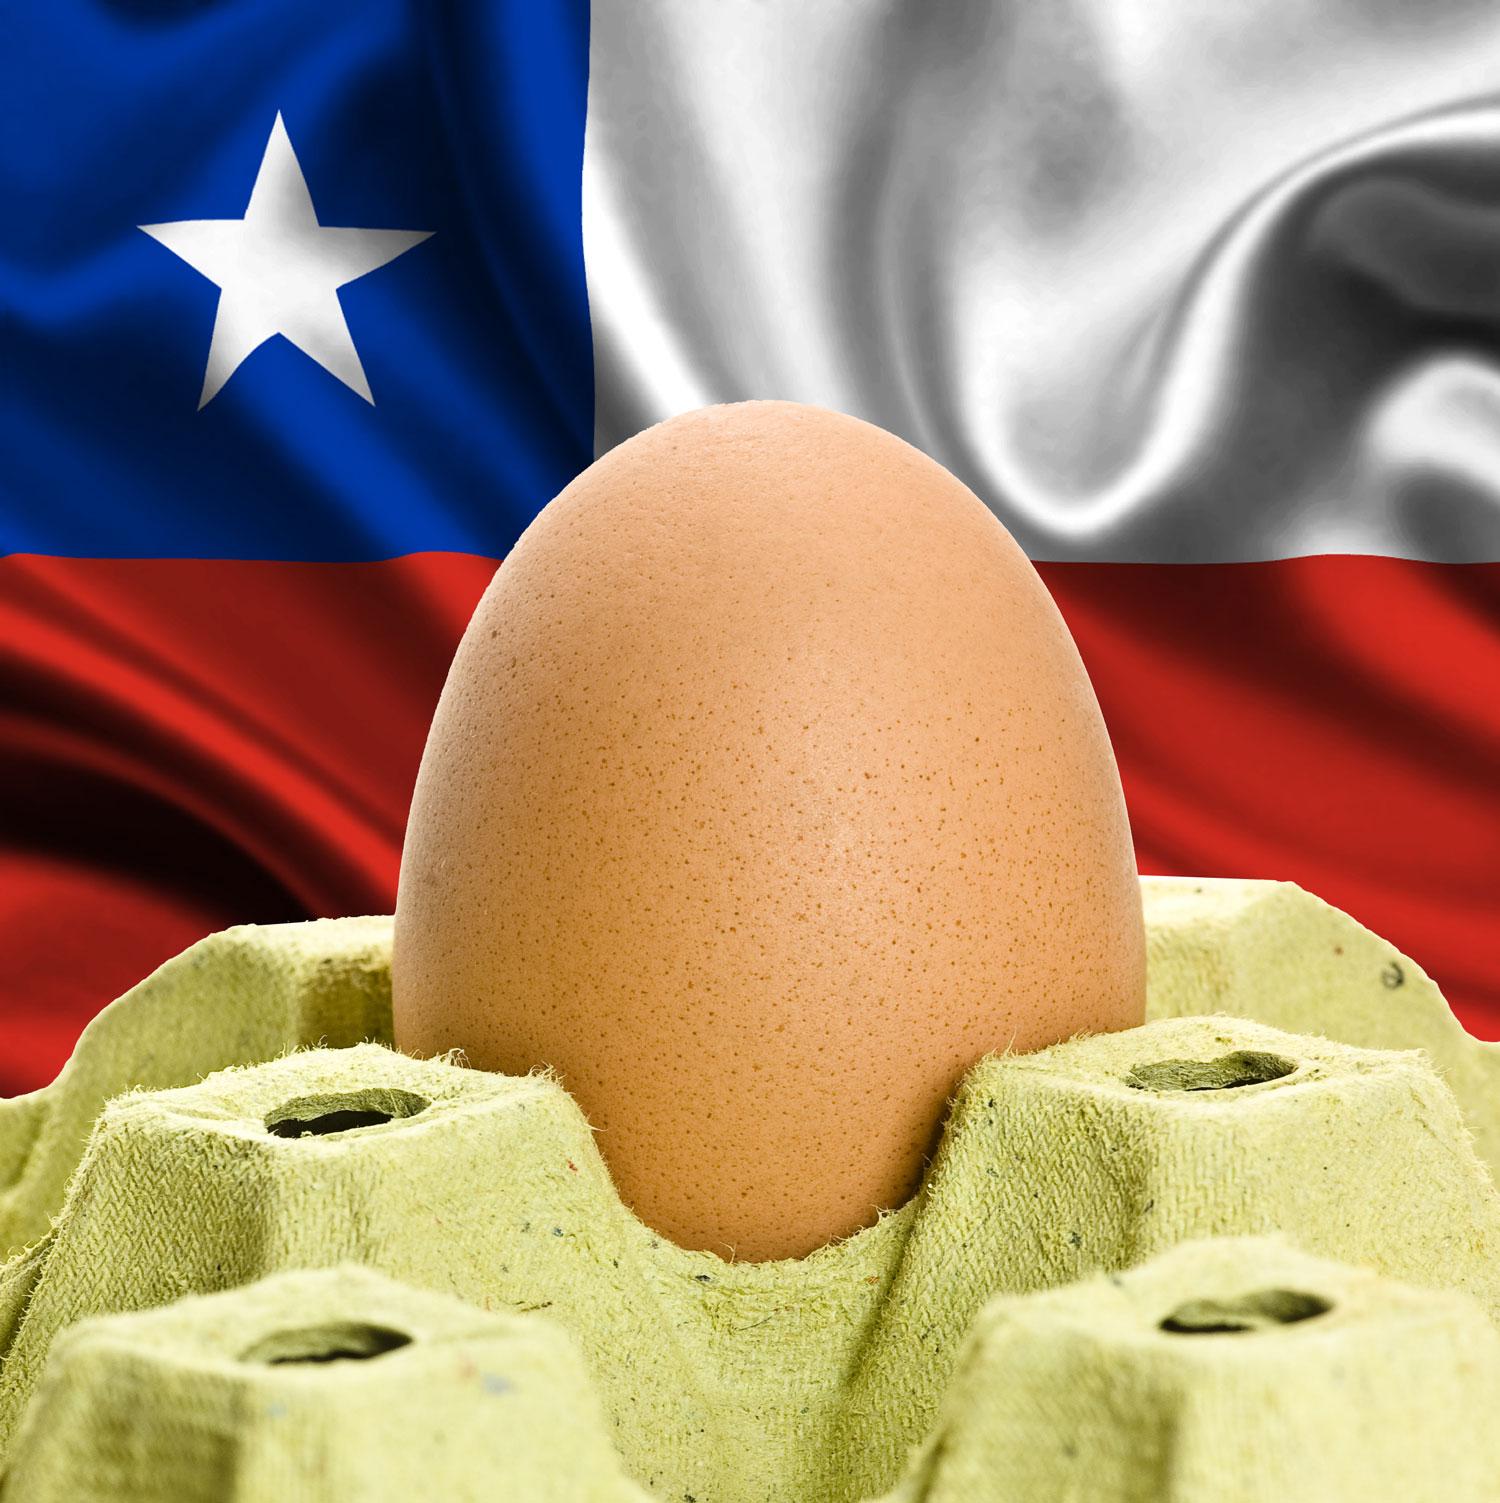 Chile tem potencial para se somar aos maiores importadores avícolas do Brasil